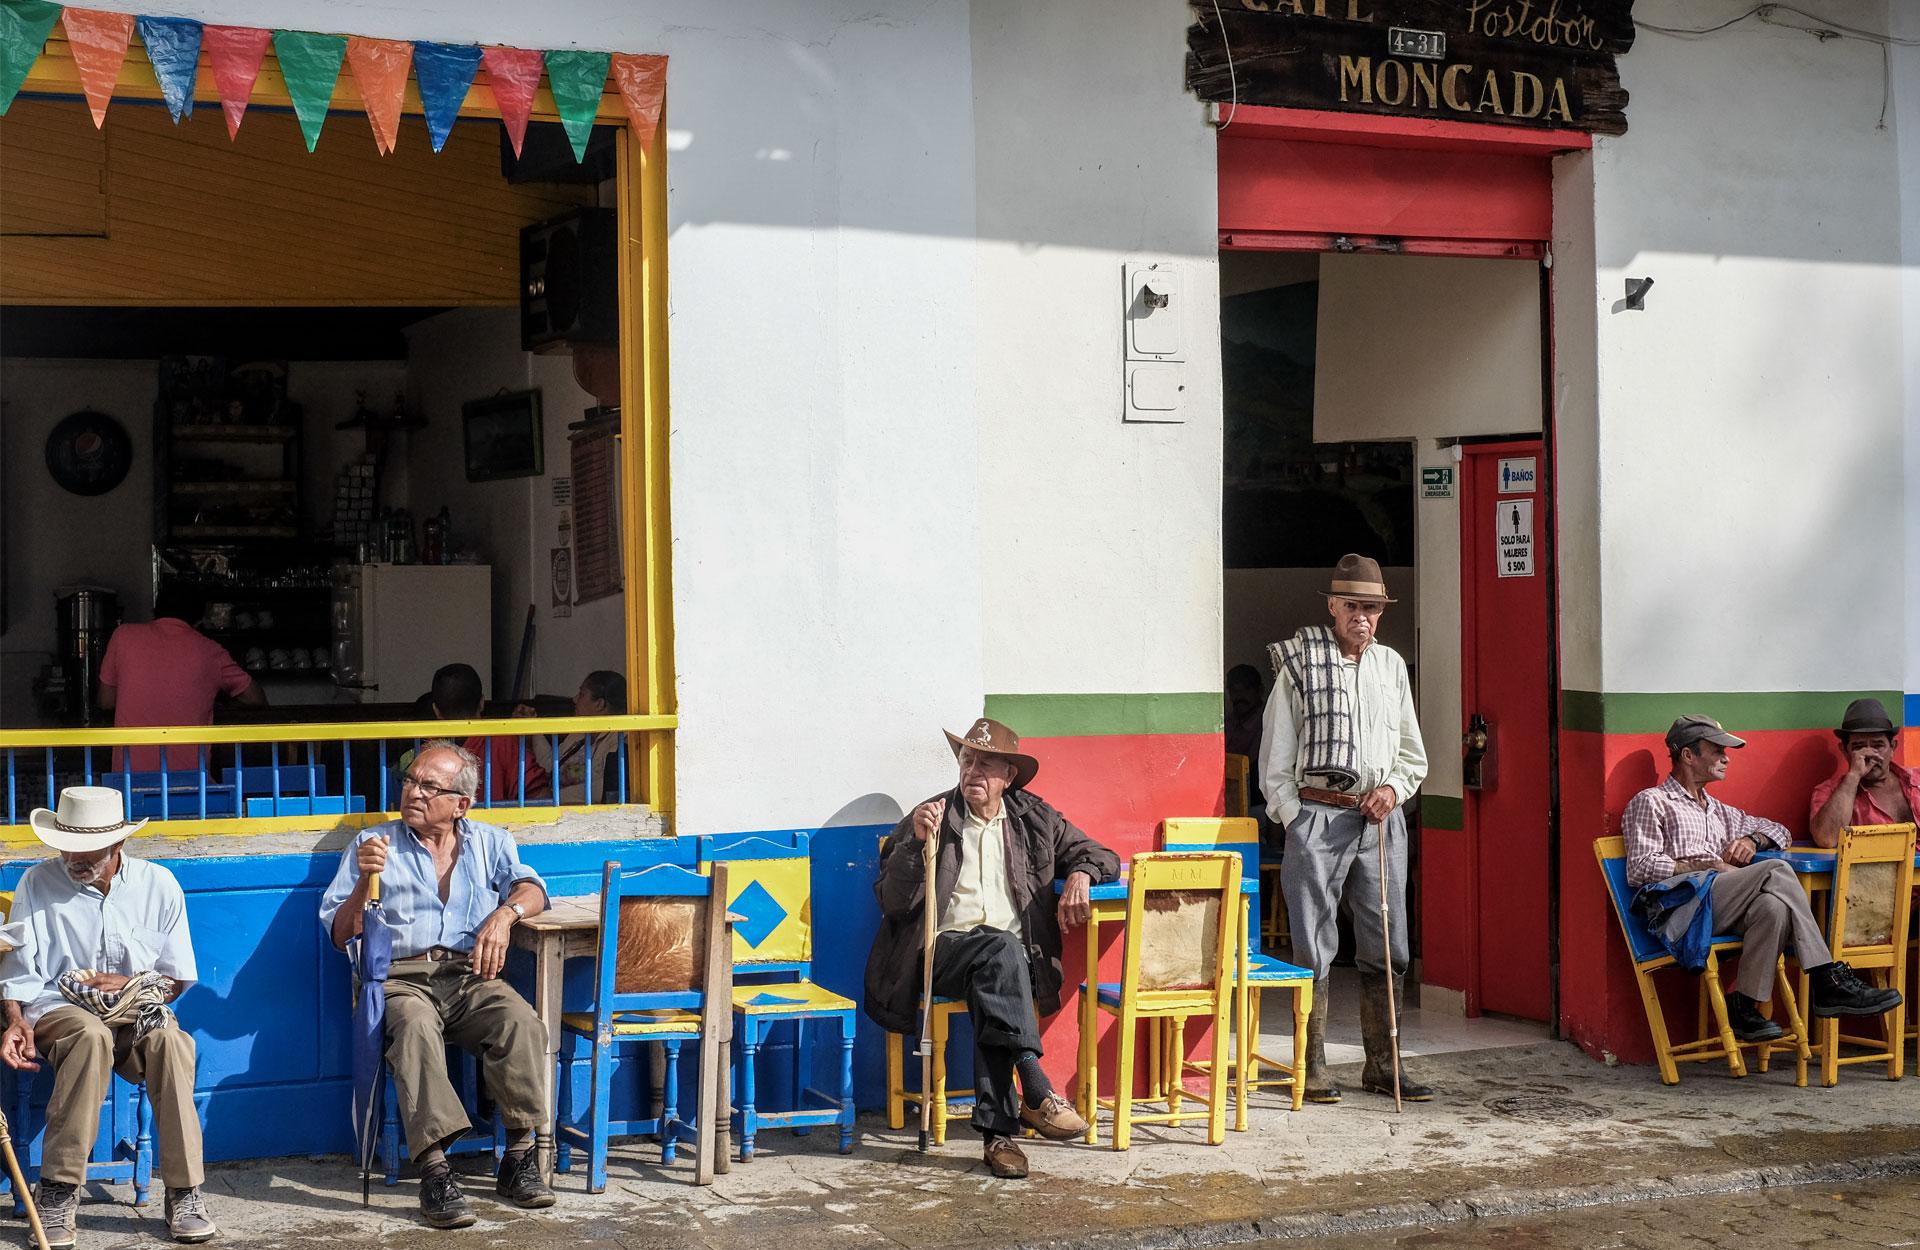 authentic Colombia Jardin, caballeros con sombrero